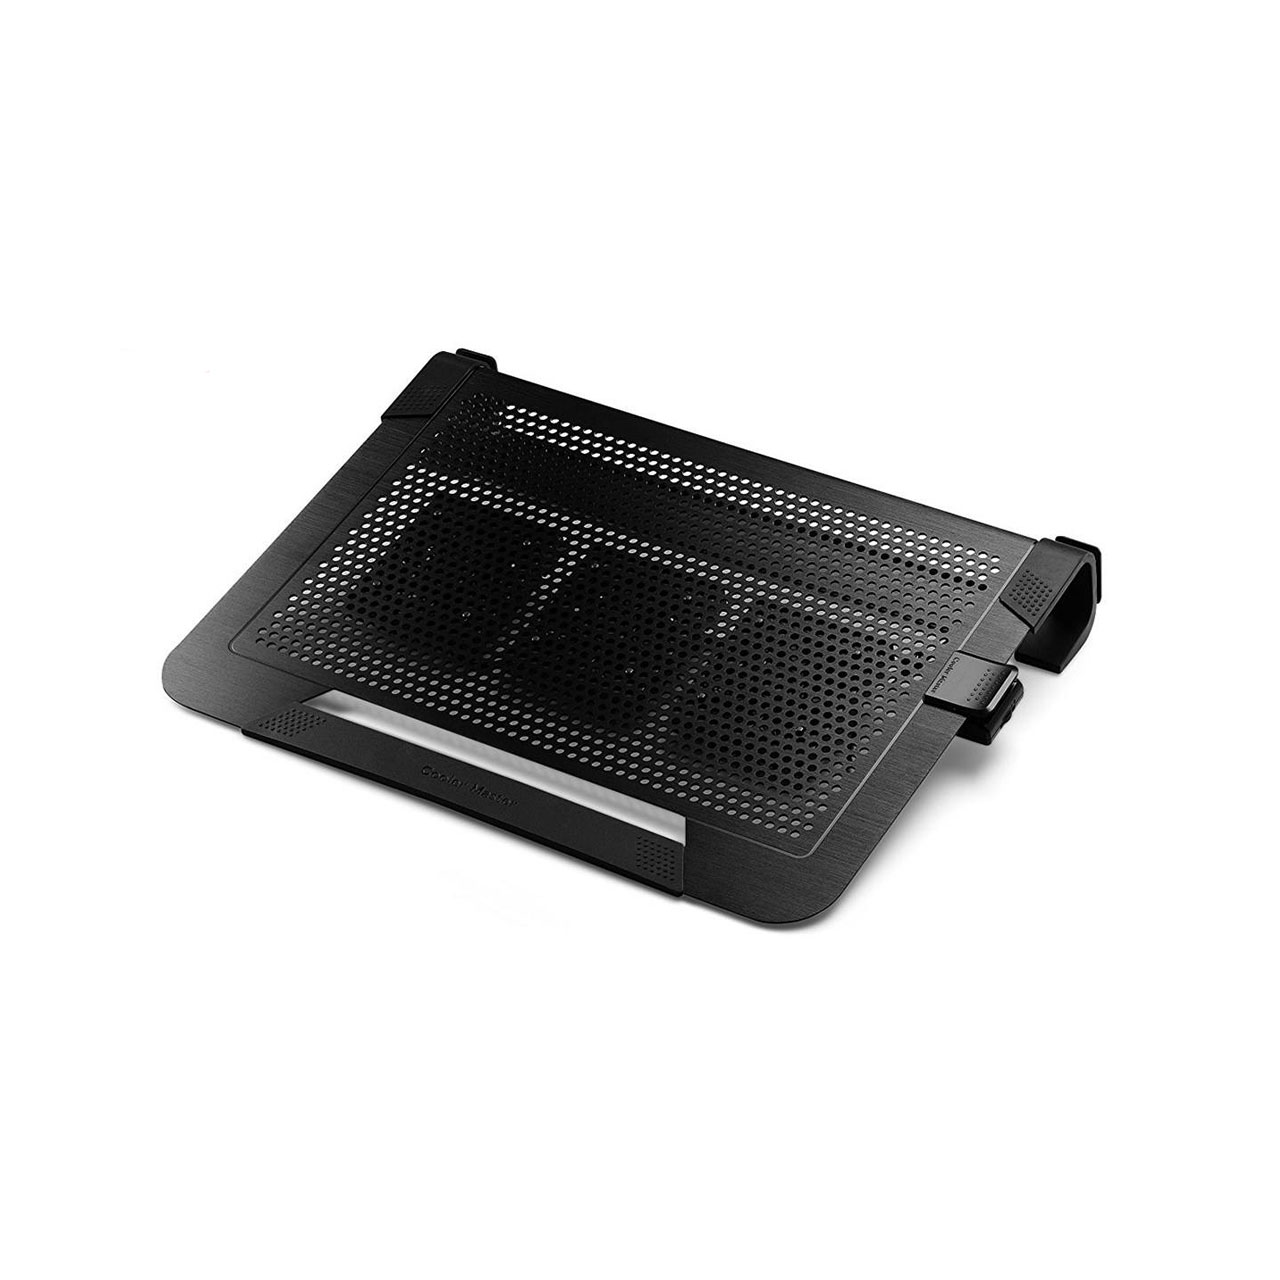 تصویر پایه خنک کننده کولر مستر مدل NotePal U3 PLUS Cooler Master NotePal U3 PLUS Coolpad